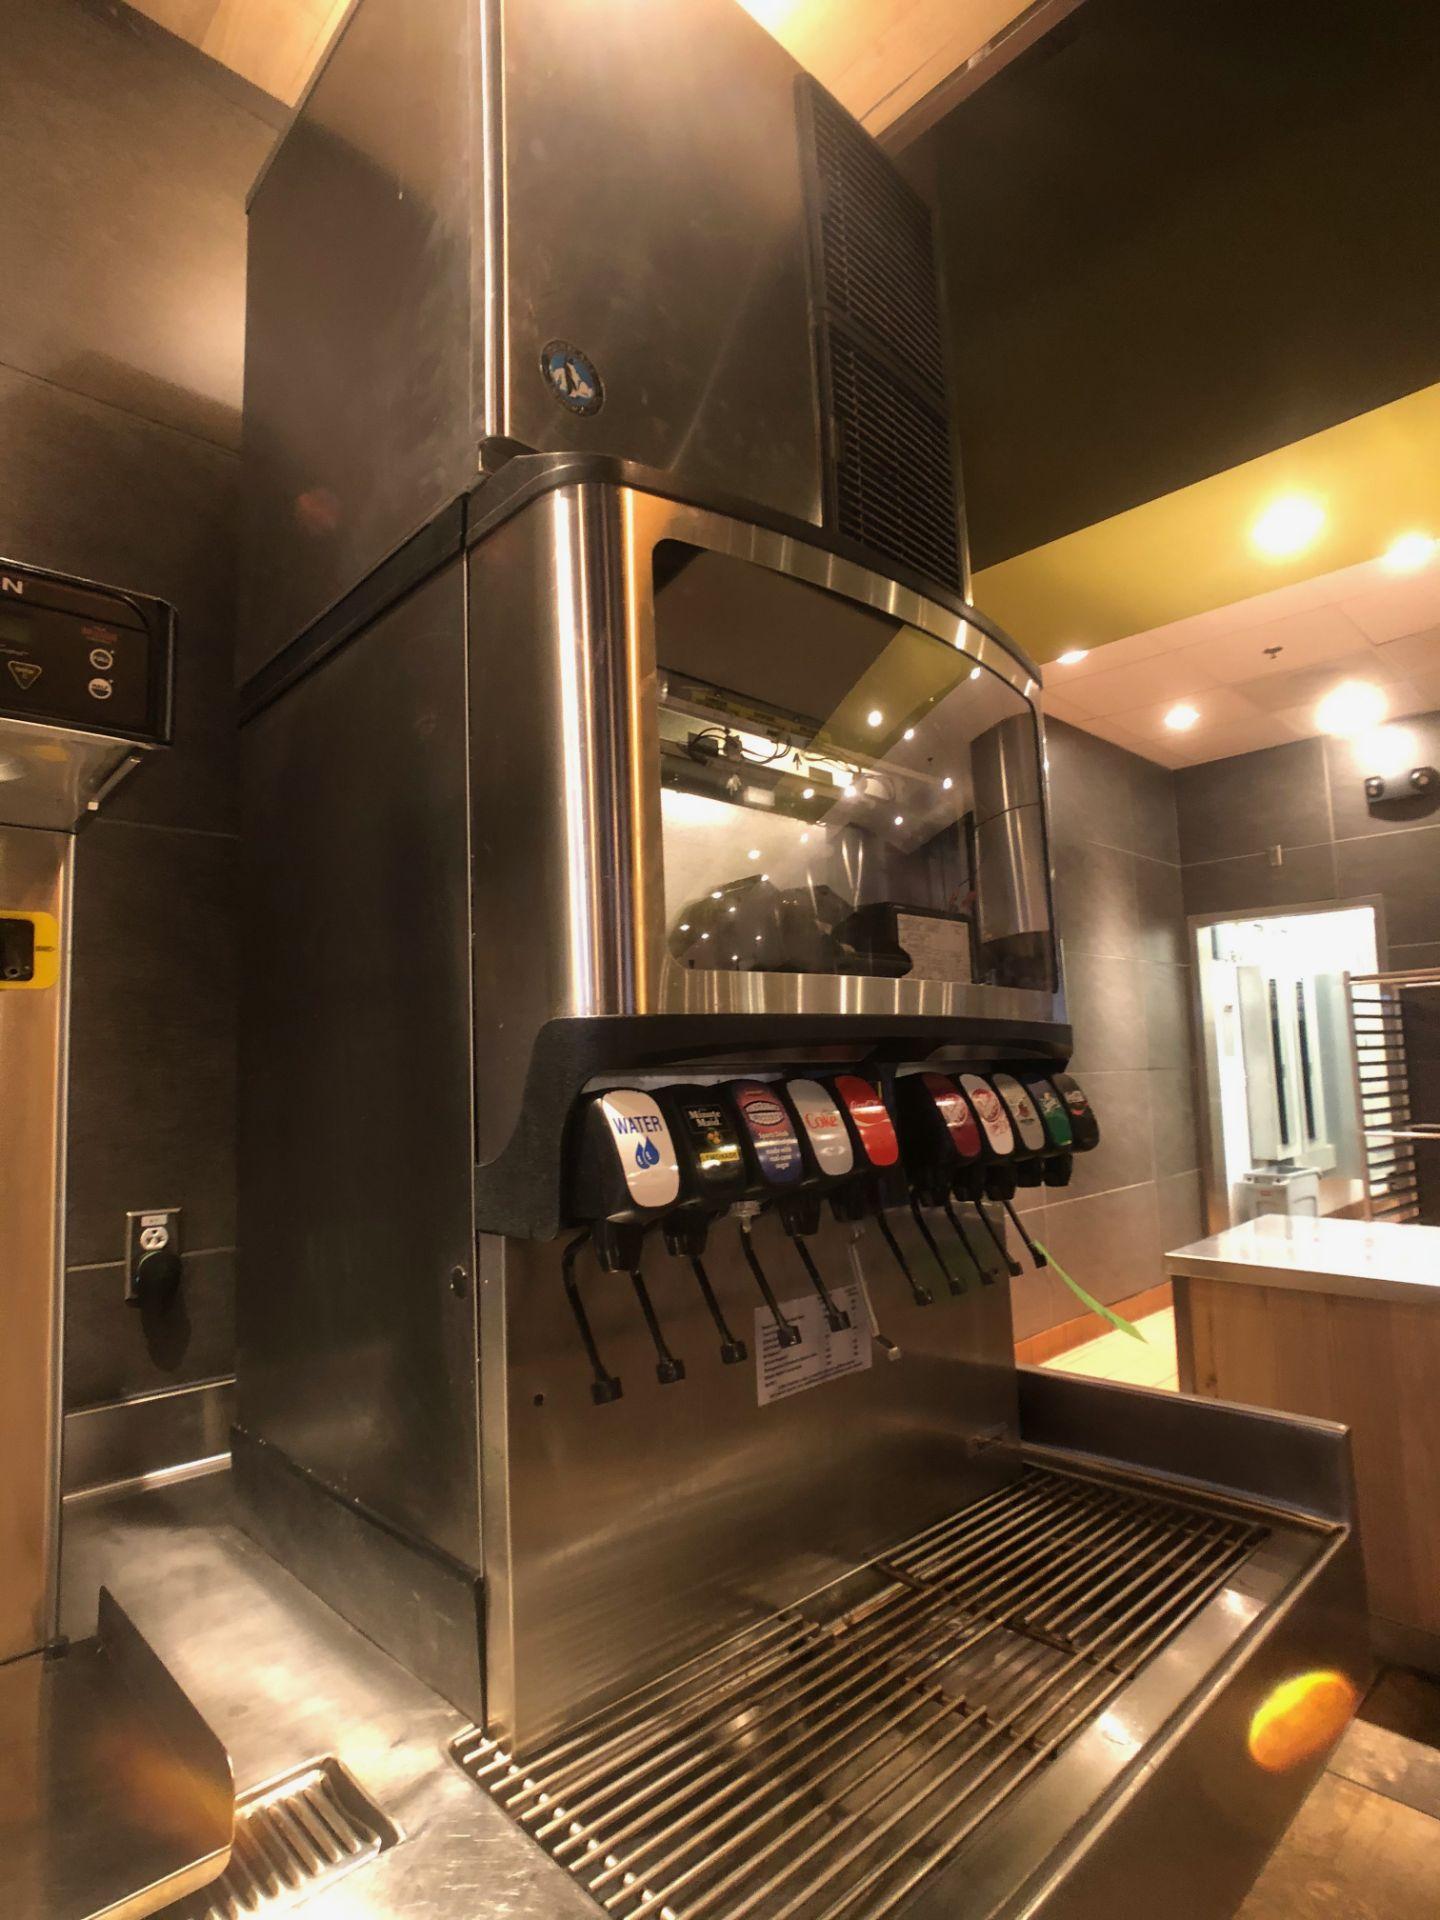 Manitowoc Beverage Systems 10-Valve Soft Drink Dispenser, Model SV250, S/N 610202454, with Hoshizaki - Image 4 of 10